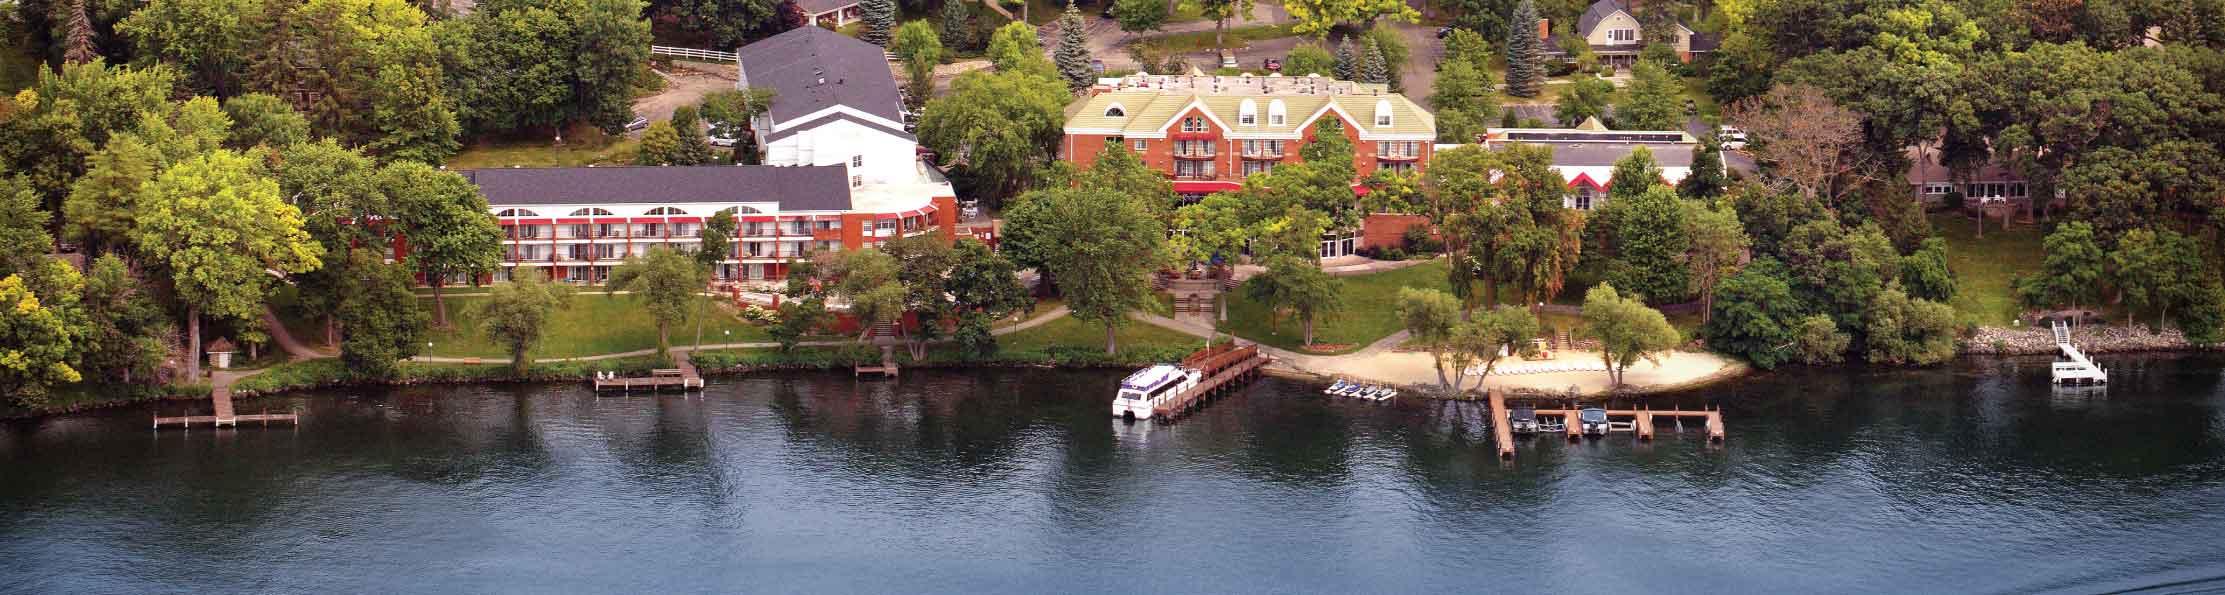 meeting planning, deals, heidel house, green lake